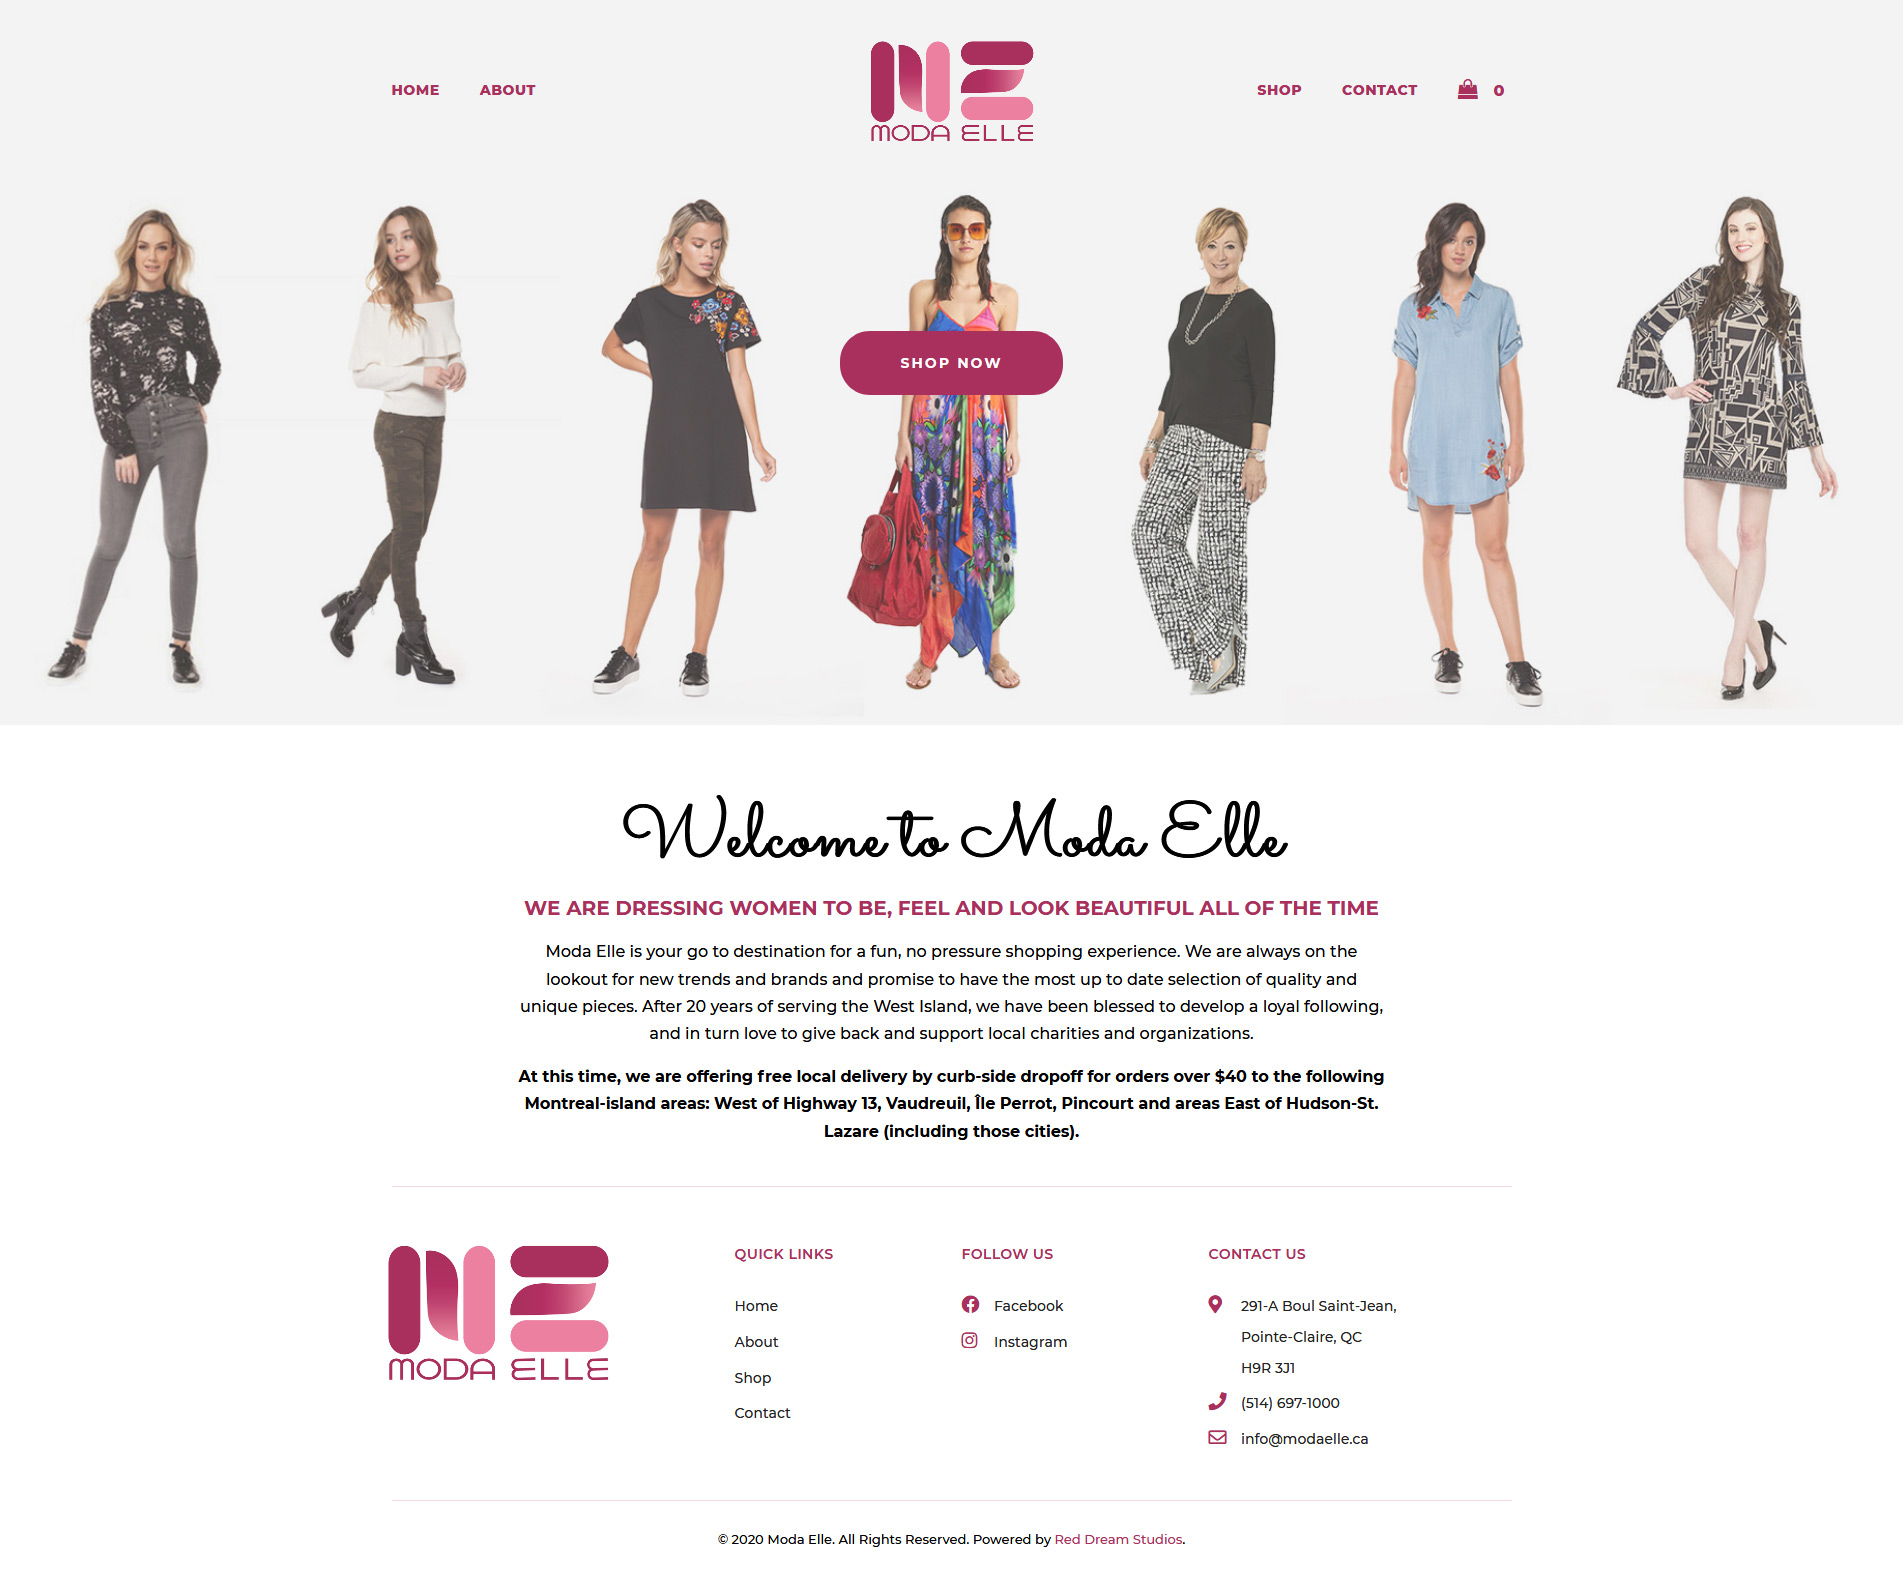 red-dream-studios-moda-elle-online-store